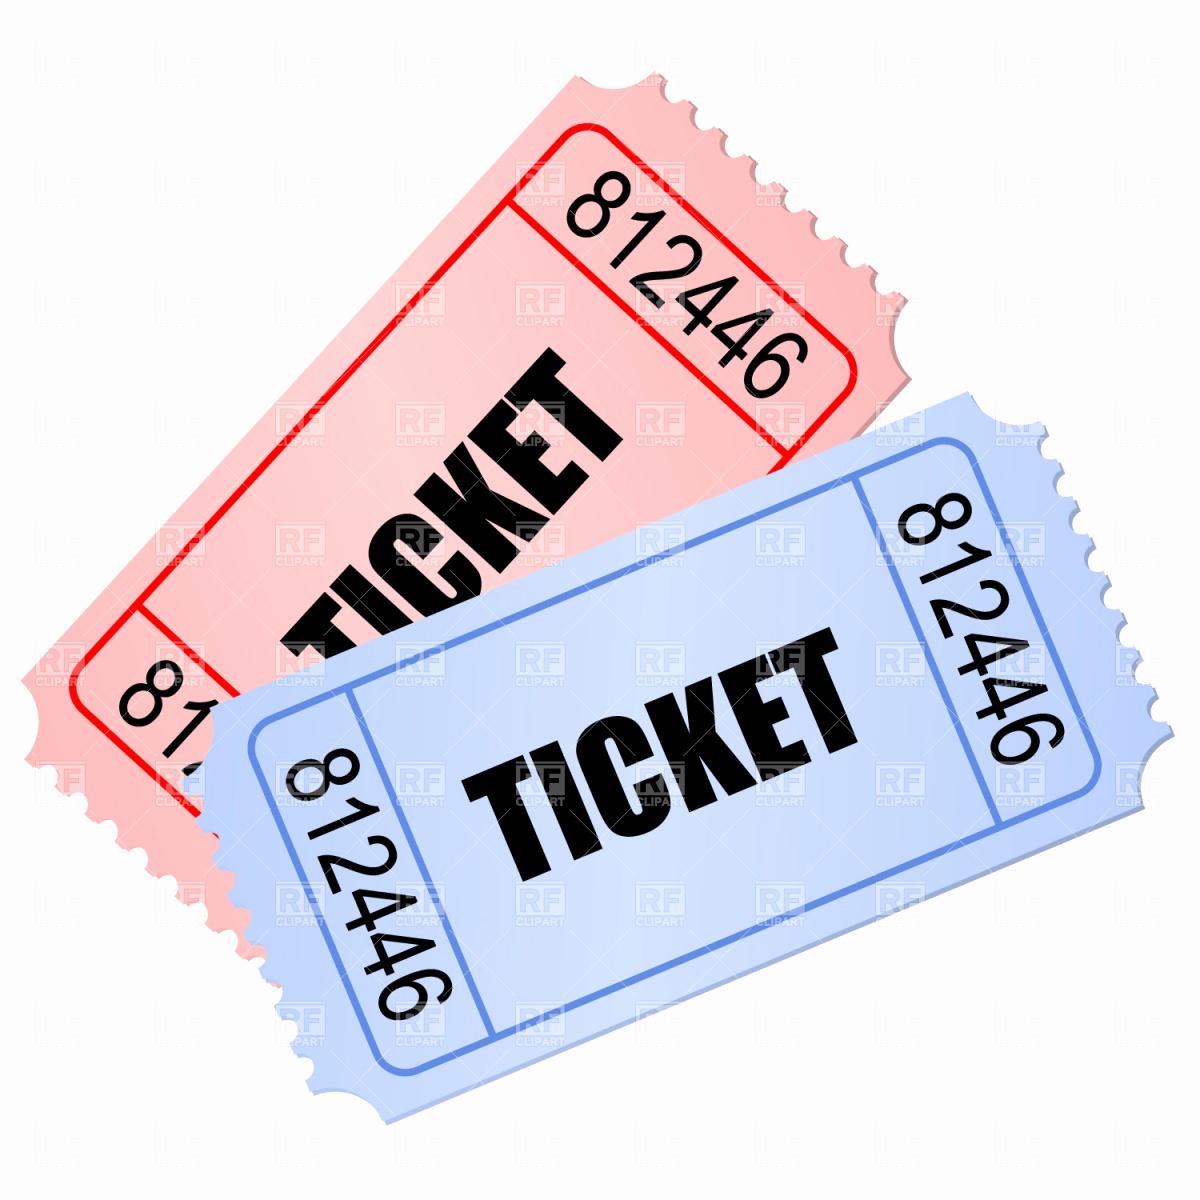 234 Raffle Ticket free clipart.